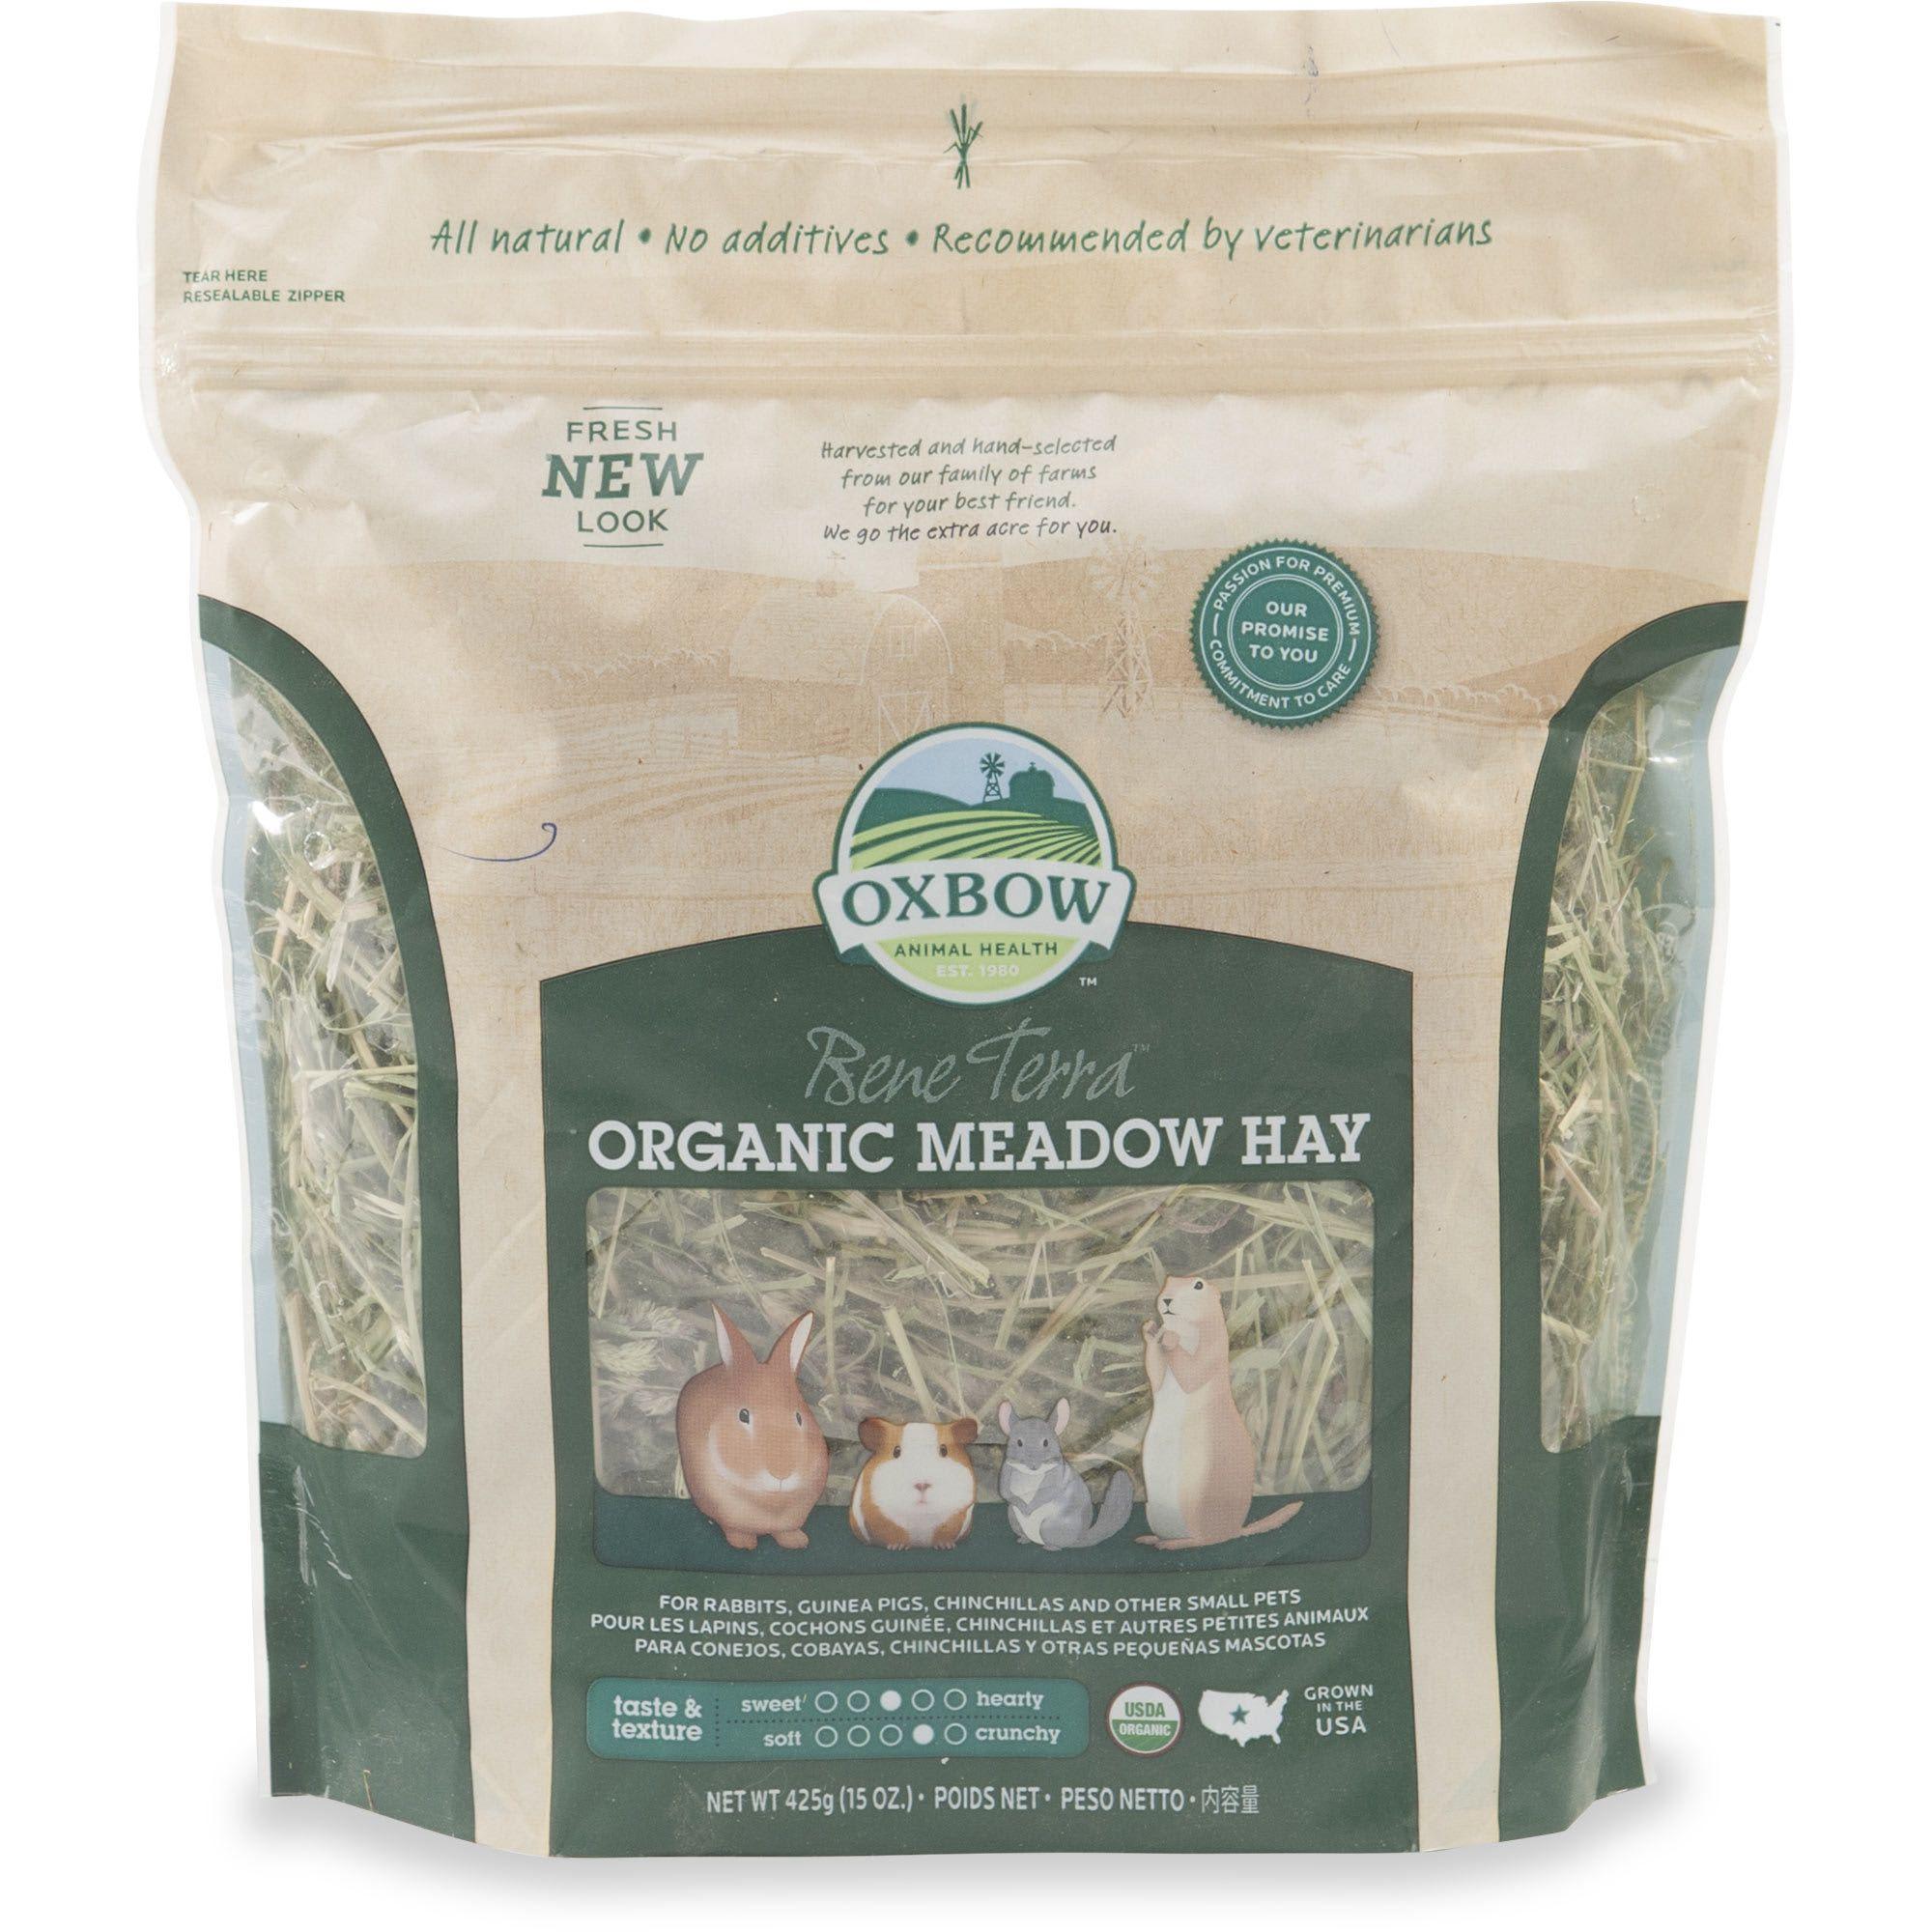 Oxbow Organic Meadow Hay 15 Oz Organic Wild Bird Food Grass Hay